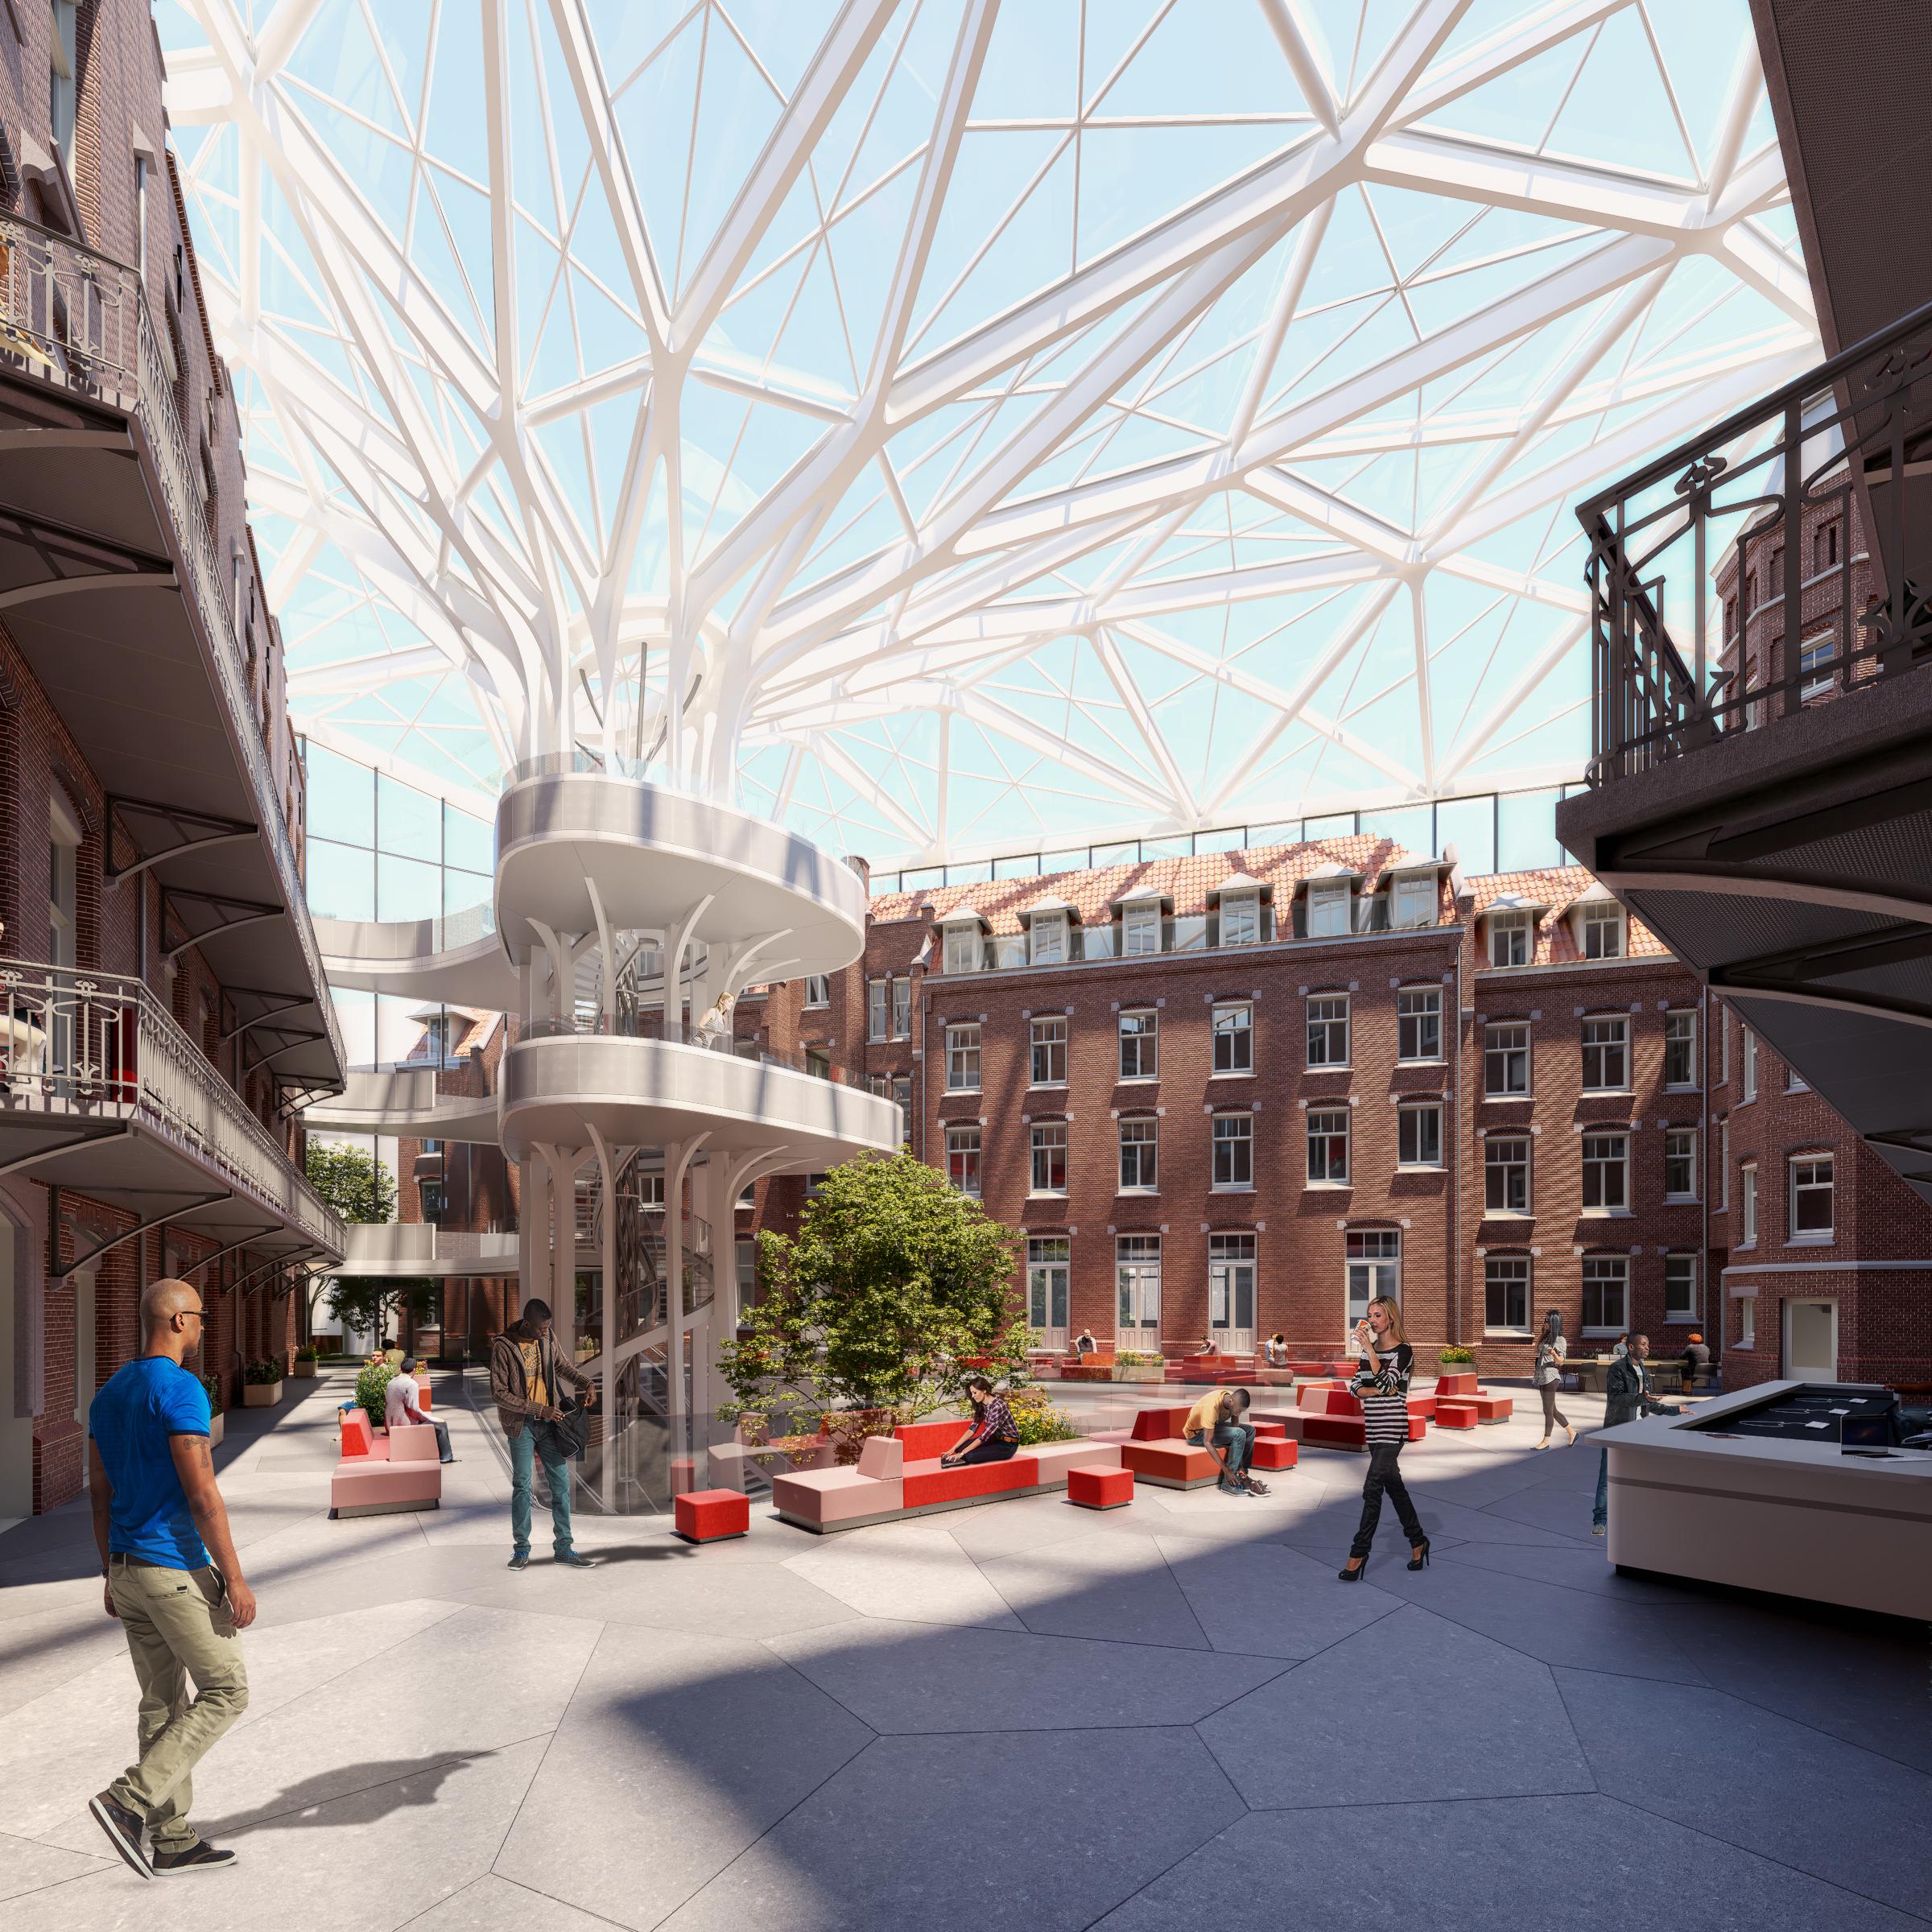 Universiteitsbibliotheek UvA, Amsterdam